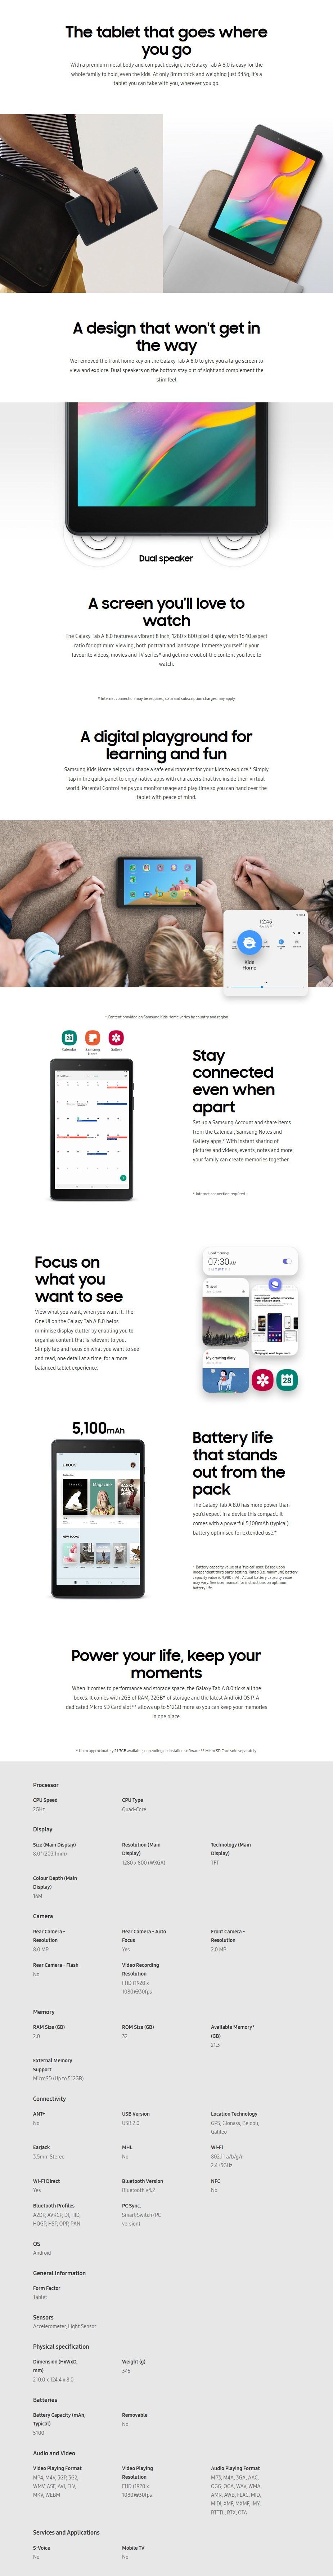 "Samsung Galaxy Tab A 8"" 2GB 32GB Wi-Fi - Black - Overview 1"